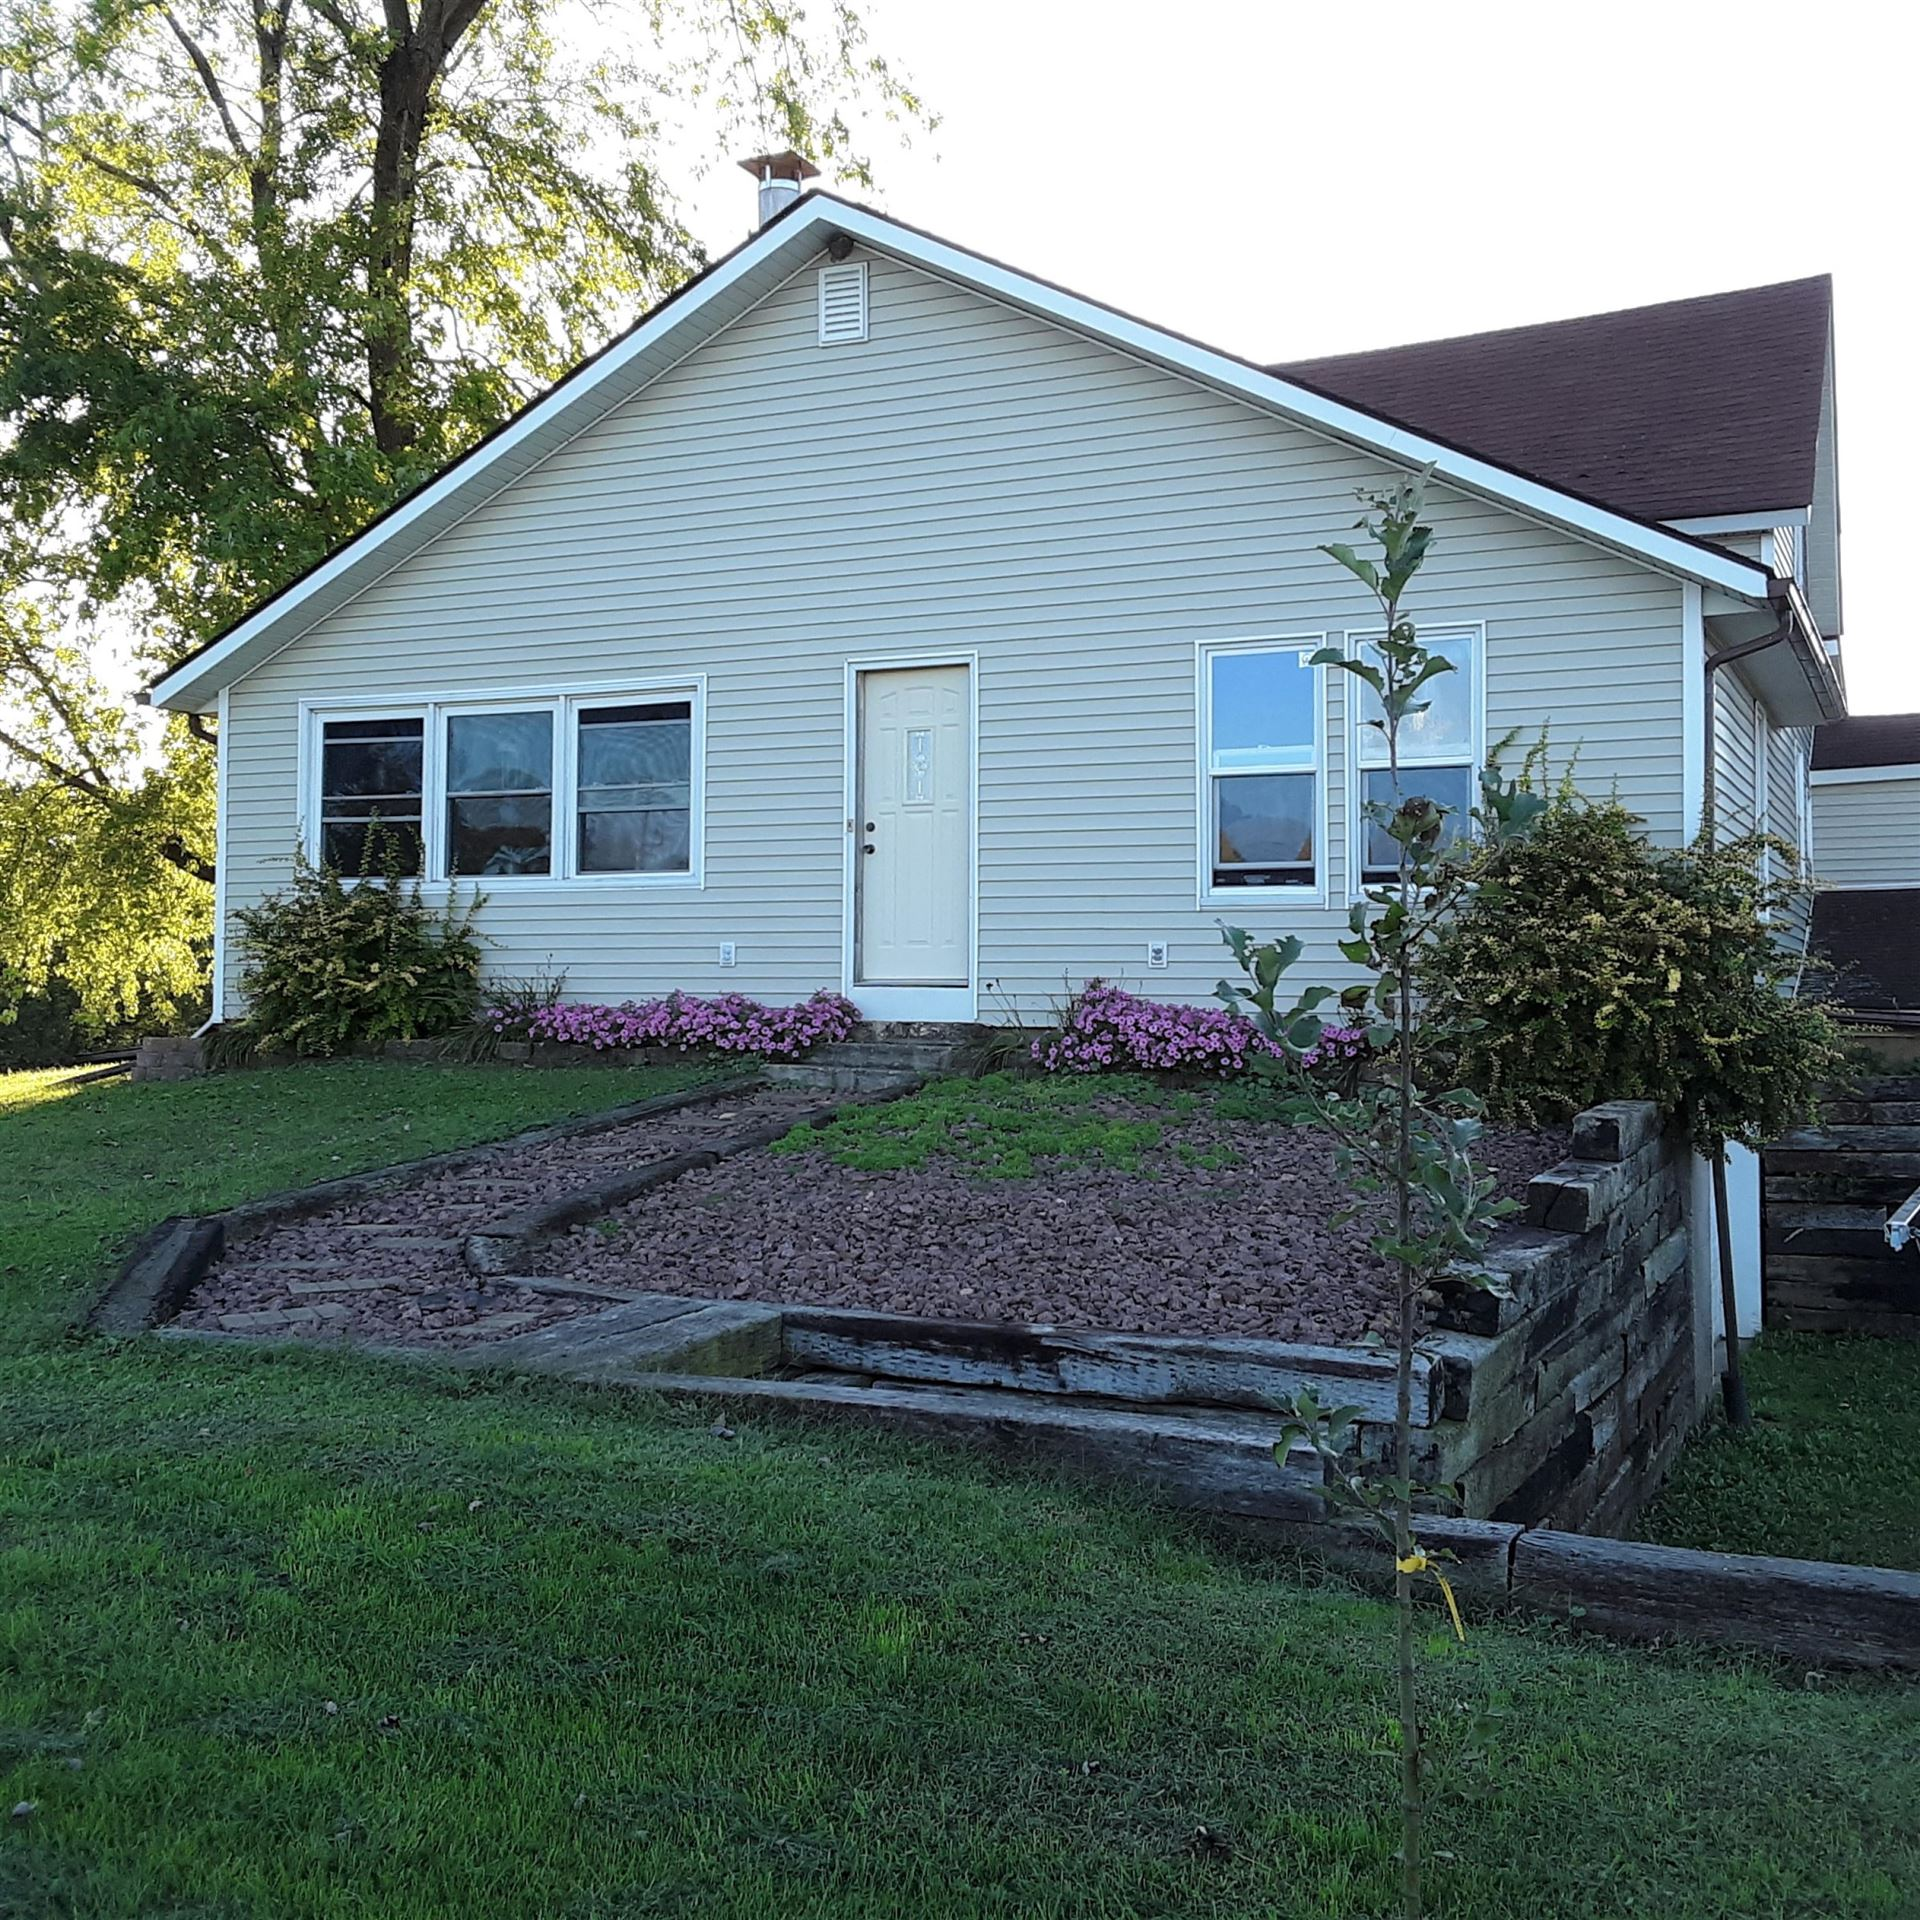 S7637 Moore Rd, Kickapoo, WI 54652 - MLS#: 1661268